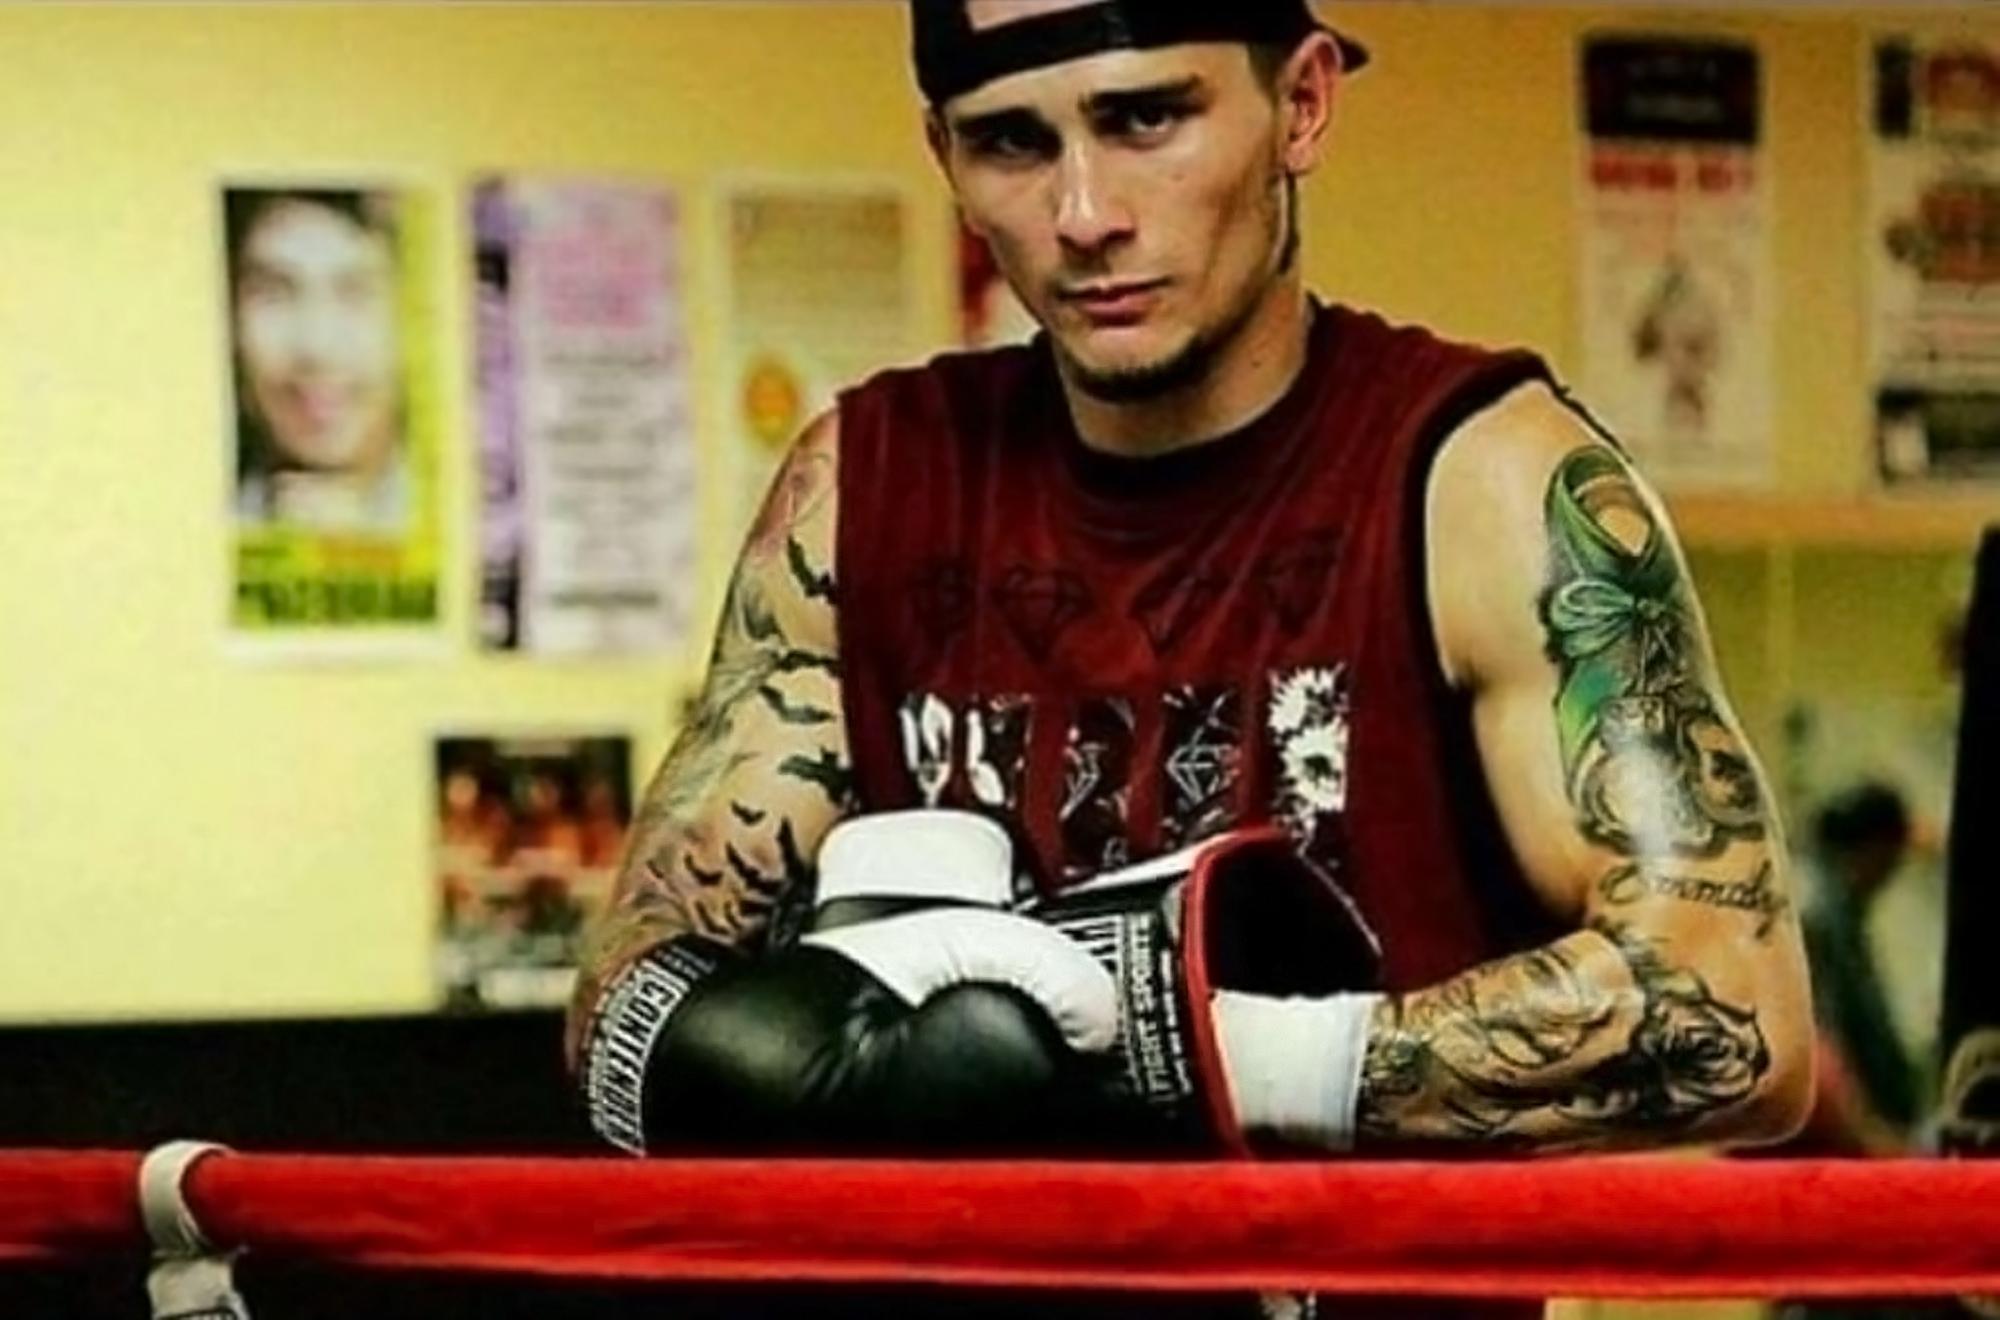 Un niño de 12 años, el asesino de un boxeador profesional en Texas